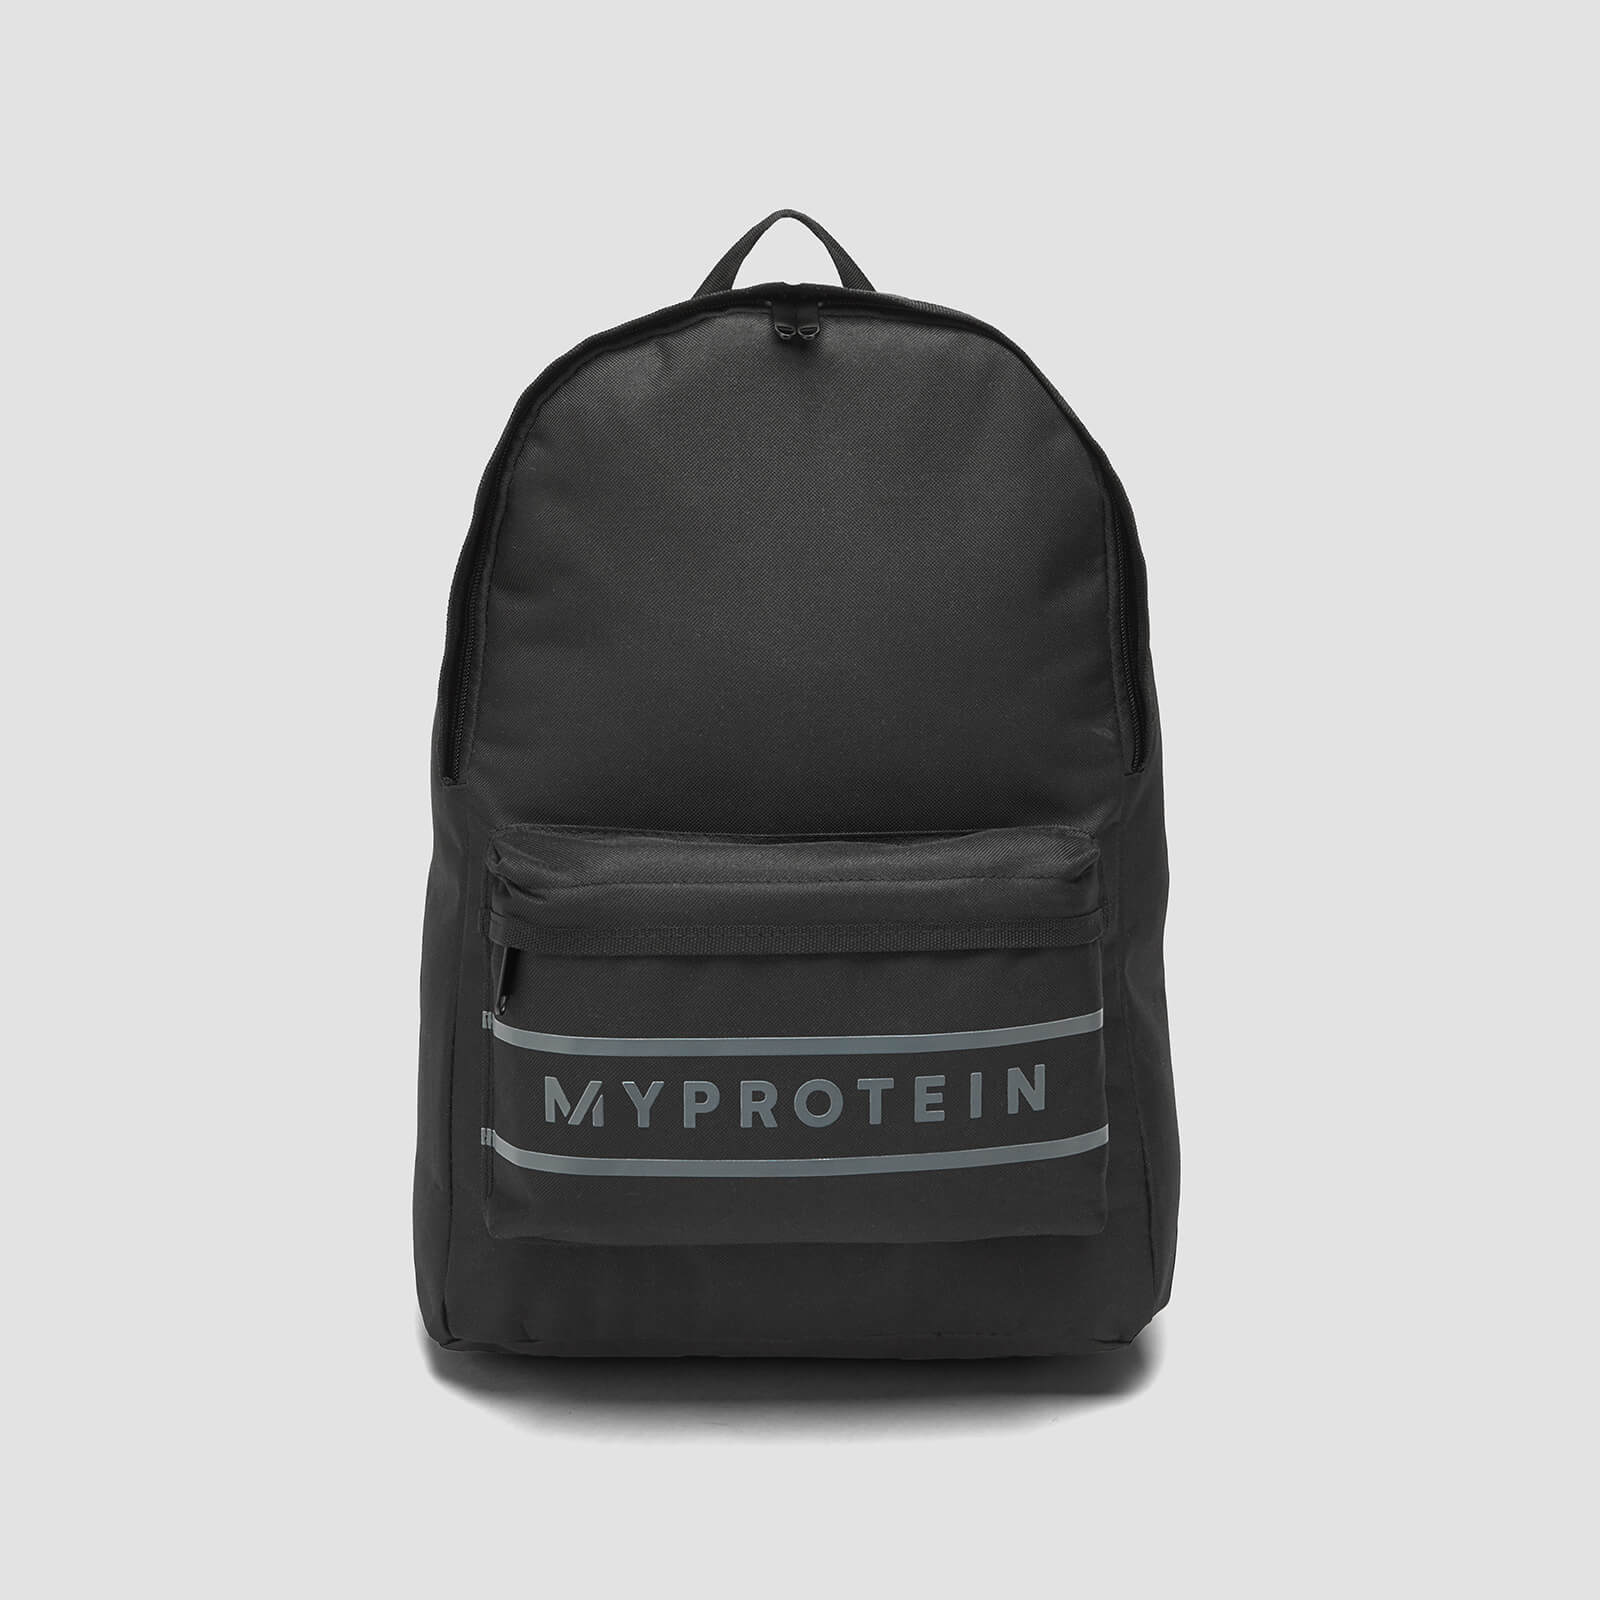 Myprotein Ryggsekk — Svart